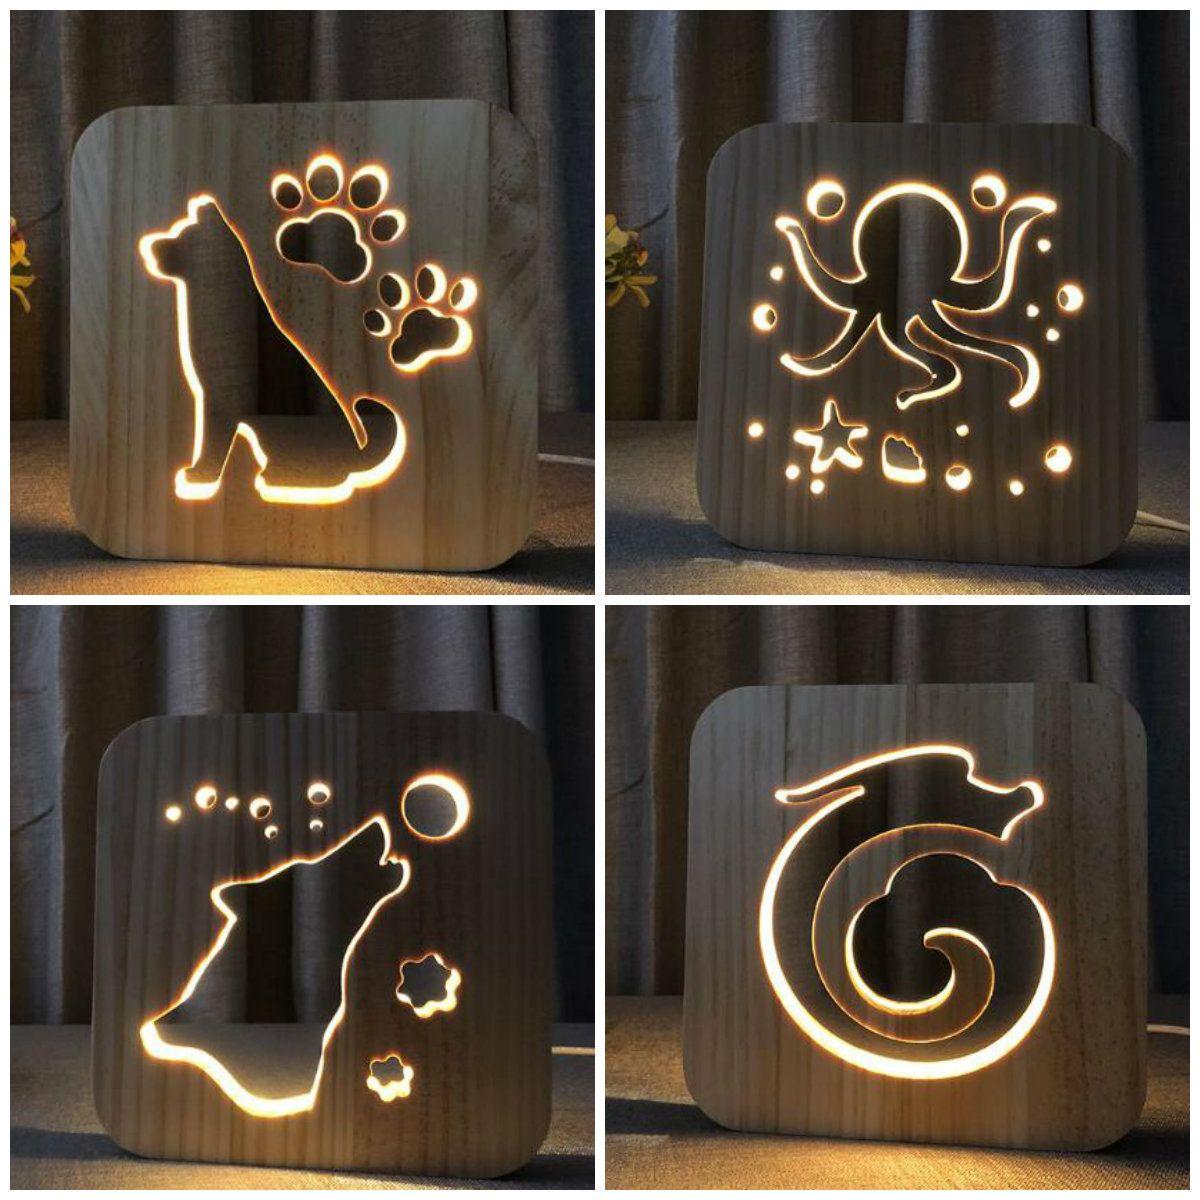 Wood Night Lamp 3d Decor Nightlight Animals Dog Wolf Octopus Dragon Decorative Led Lighting Gift For Bedroom Kid Gift Iy801101 Lampu Lampu Tidur Tidur